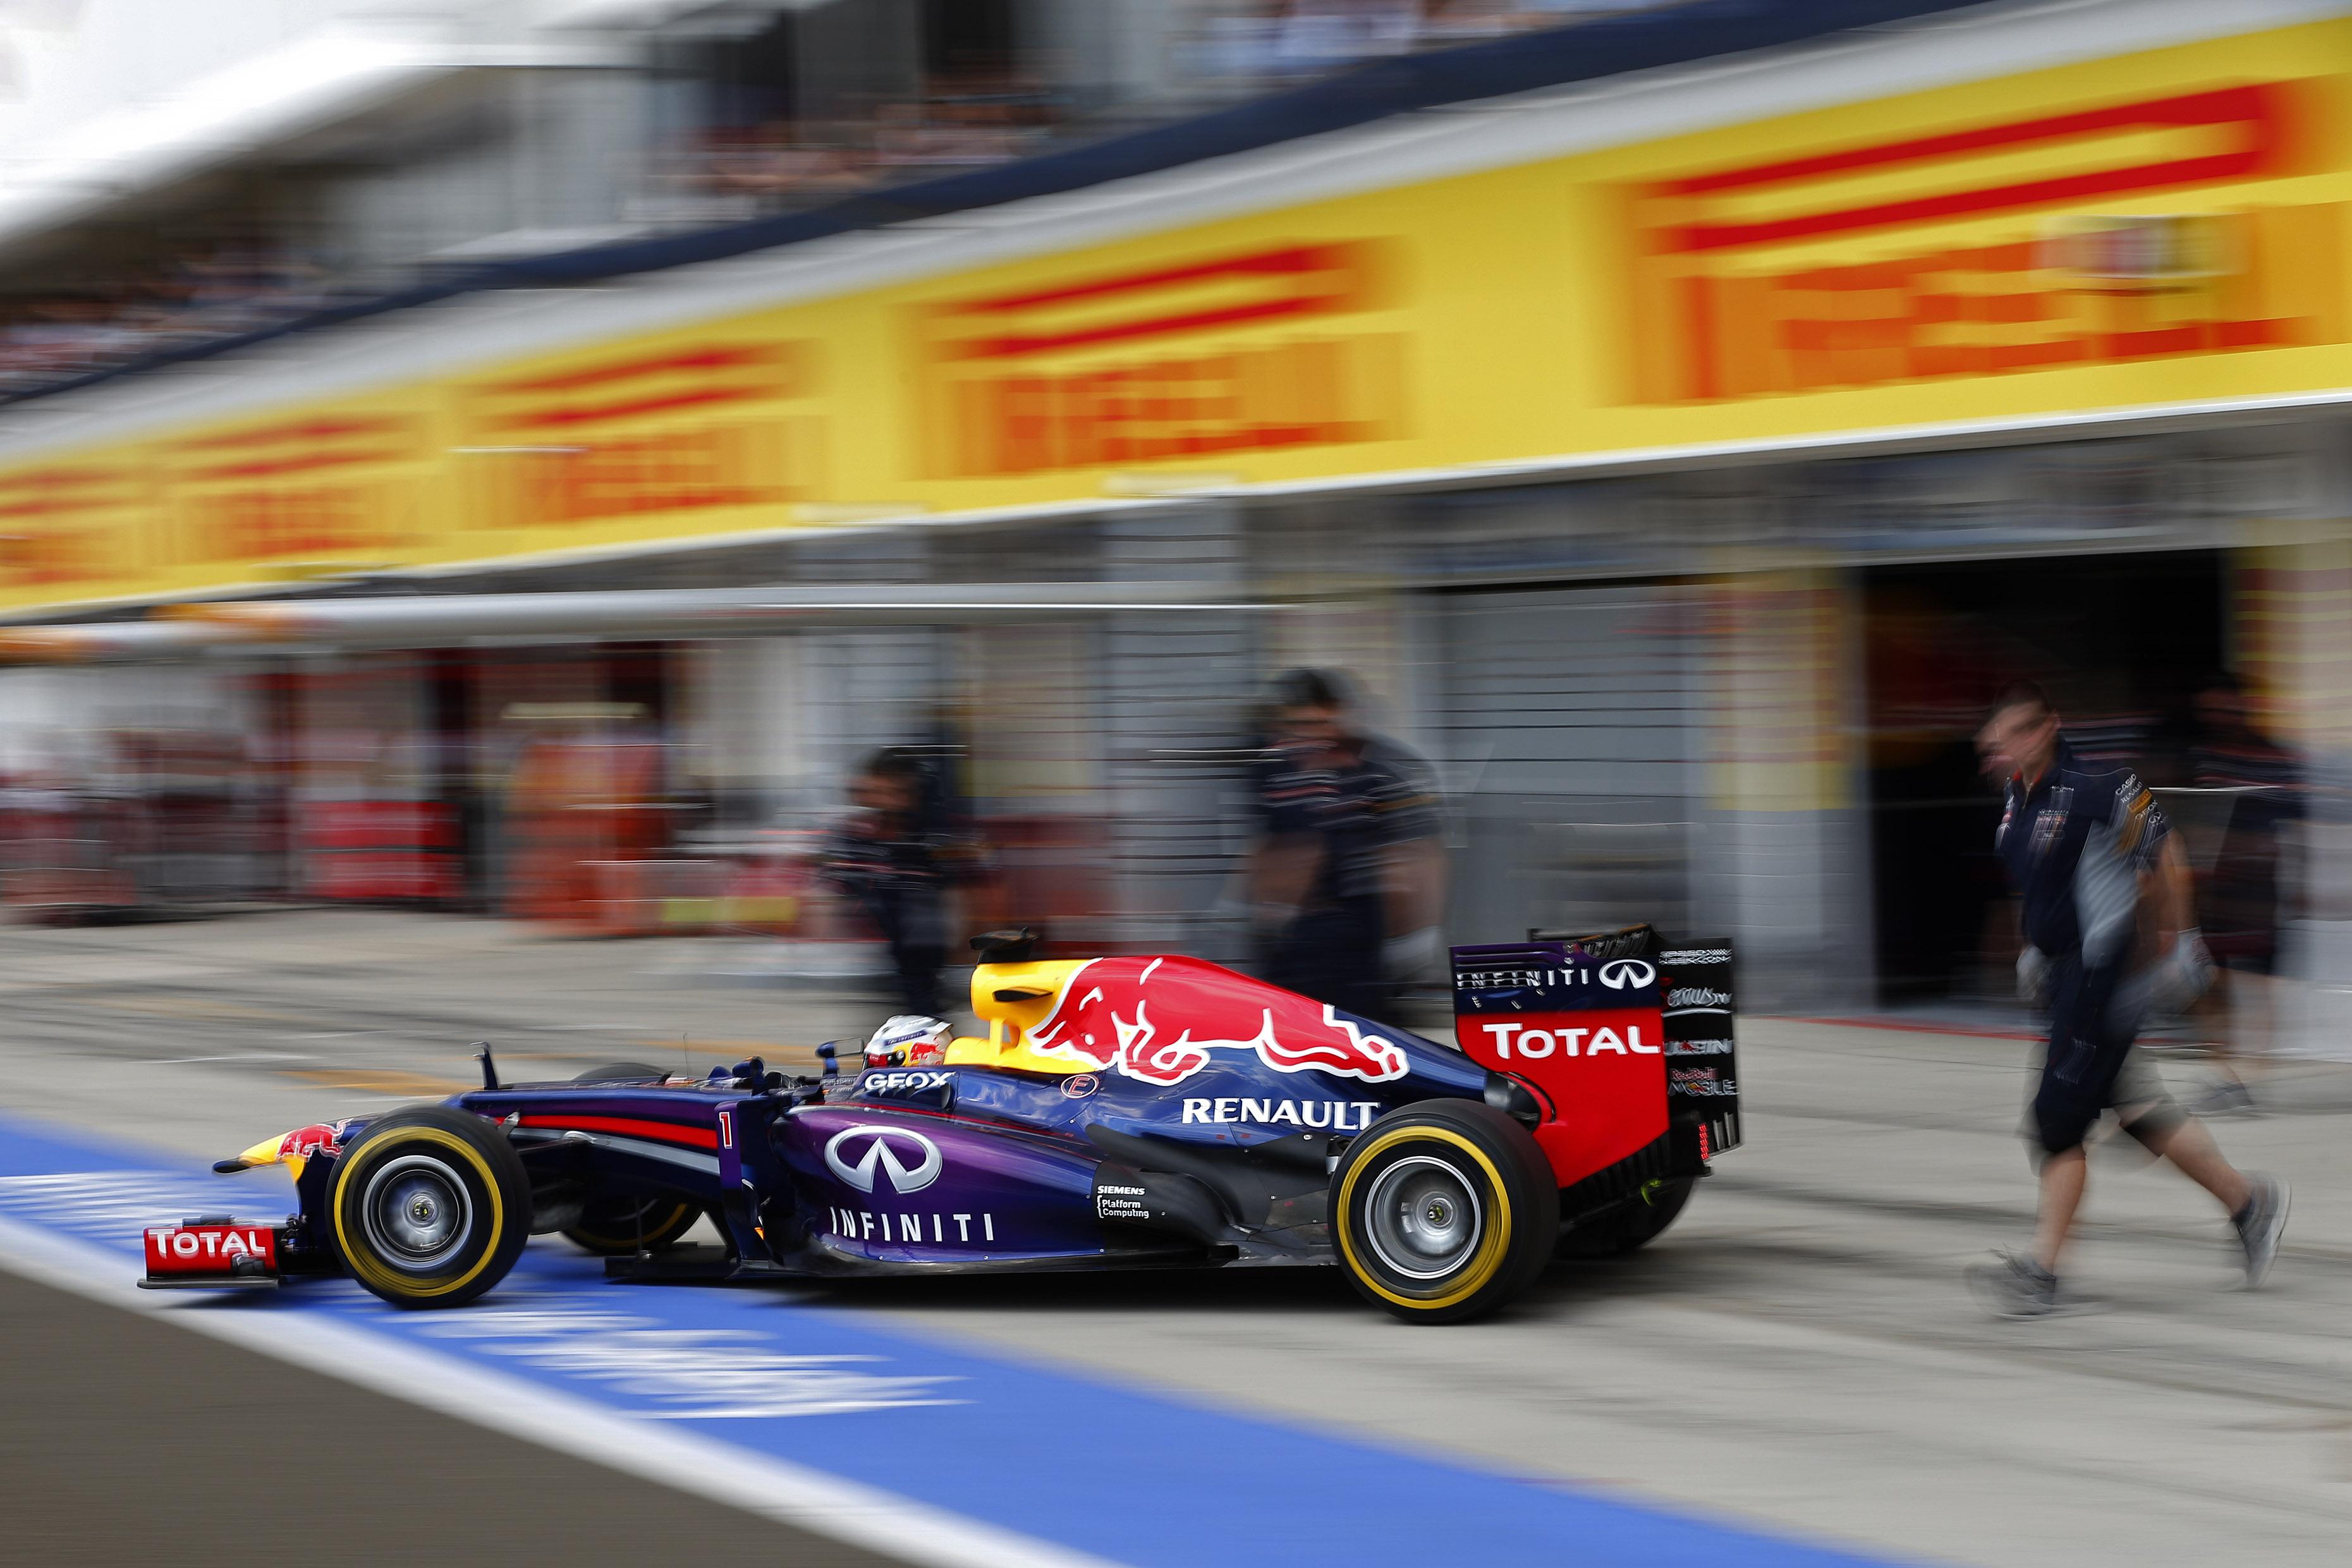 F1 2013 - Hungarian Grand Prix